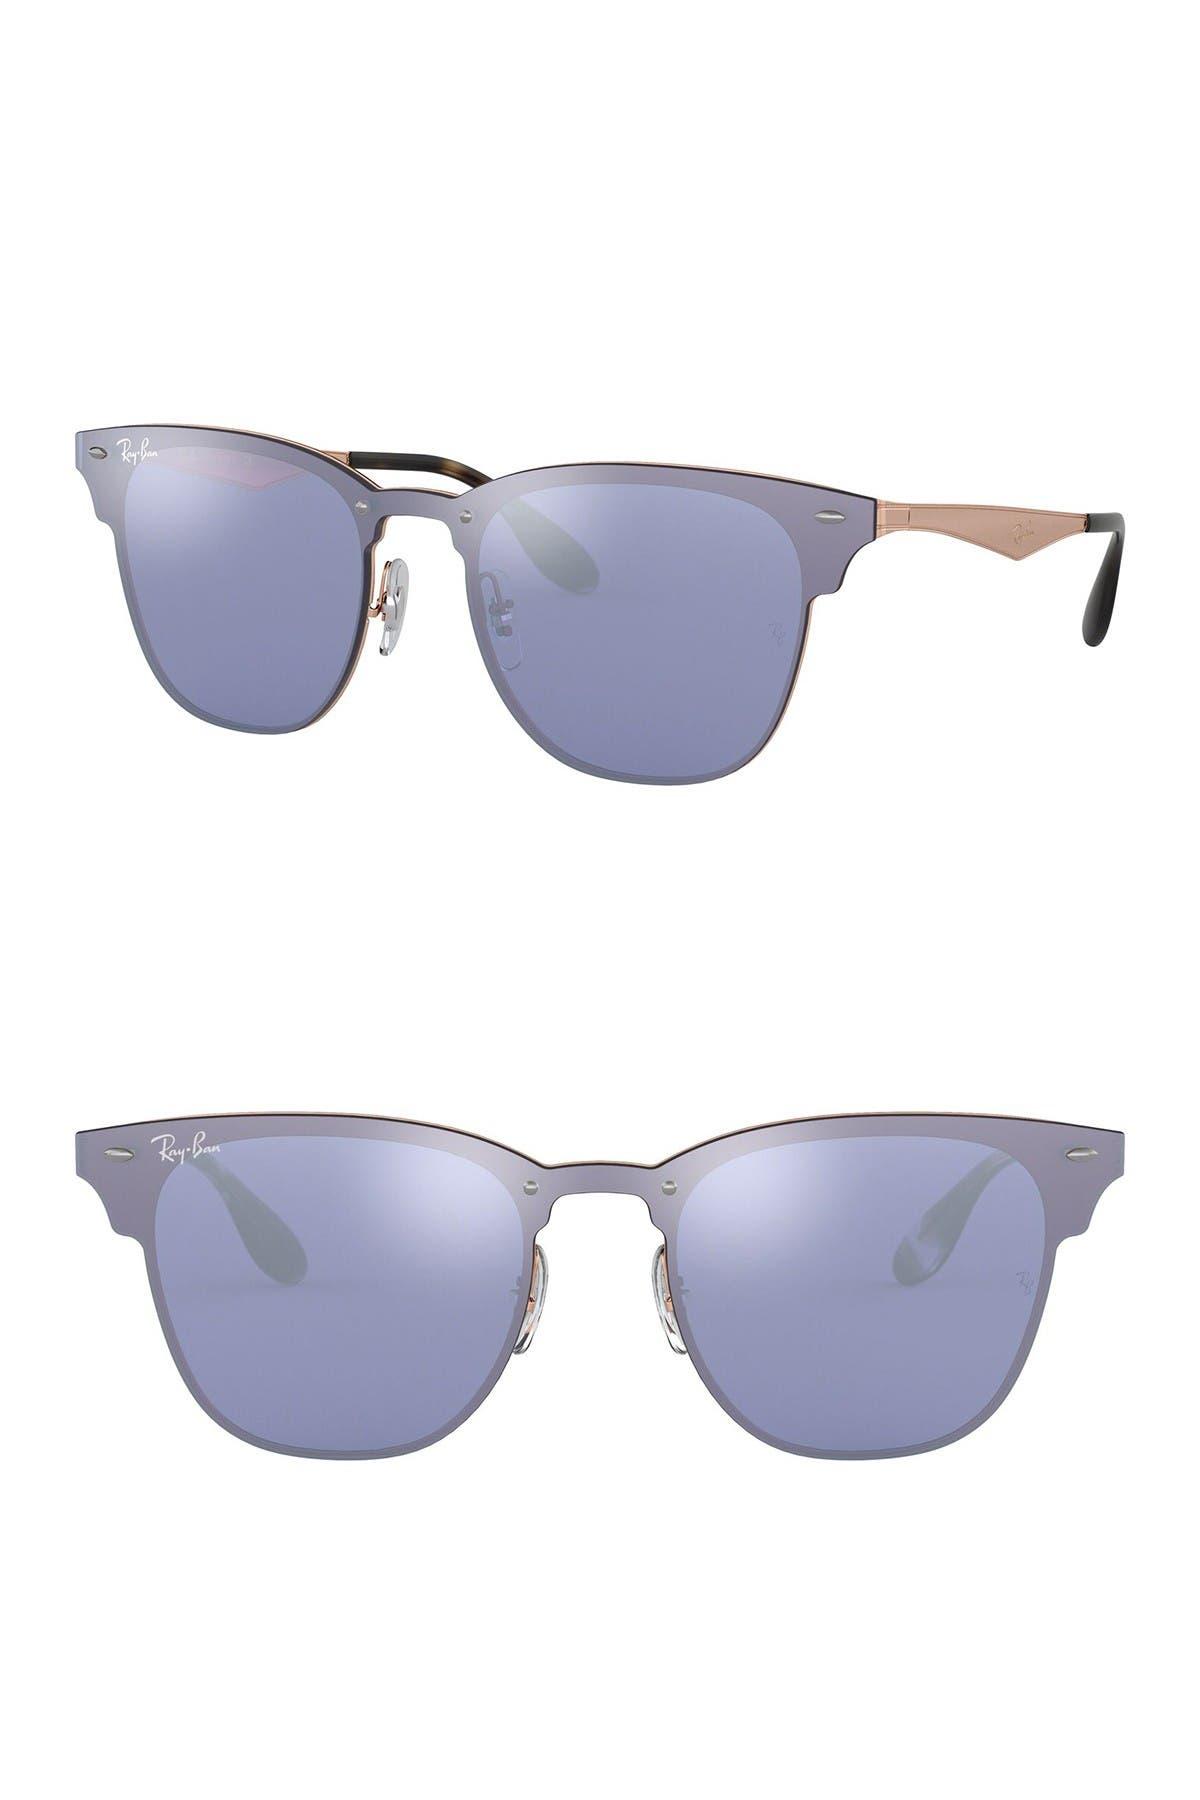 Image of Ray-Ban 41mm Square Shield Sunglasses